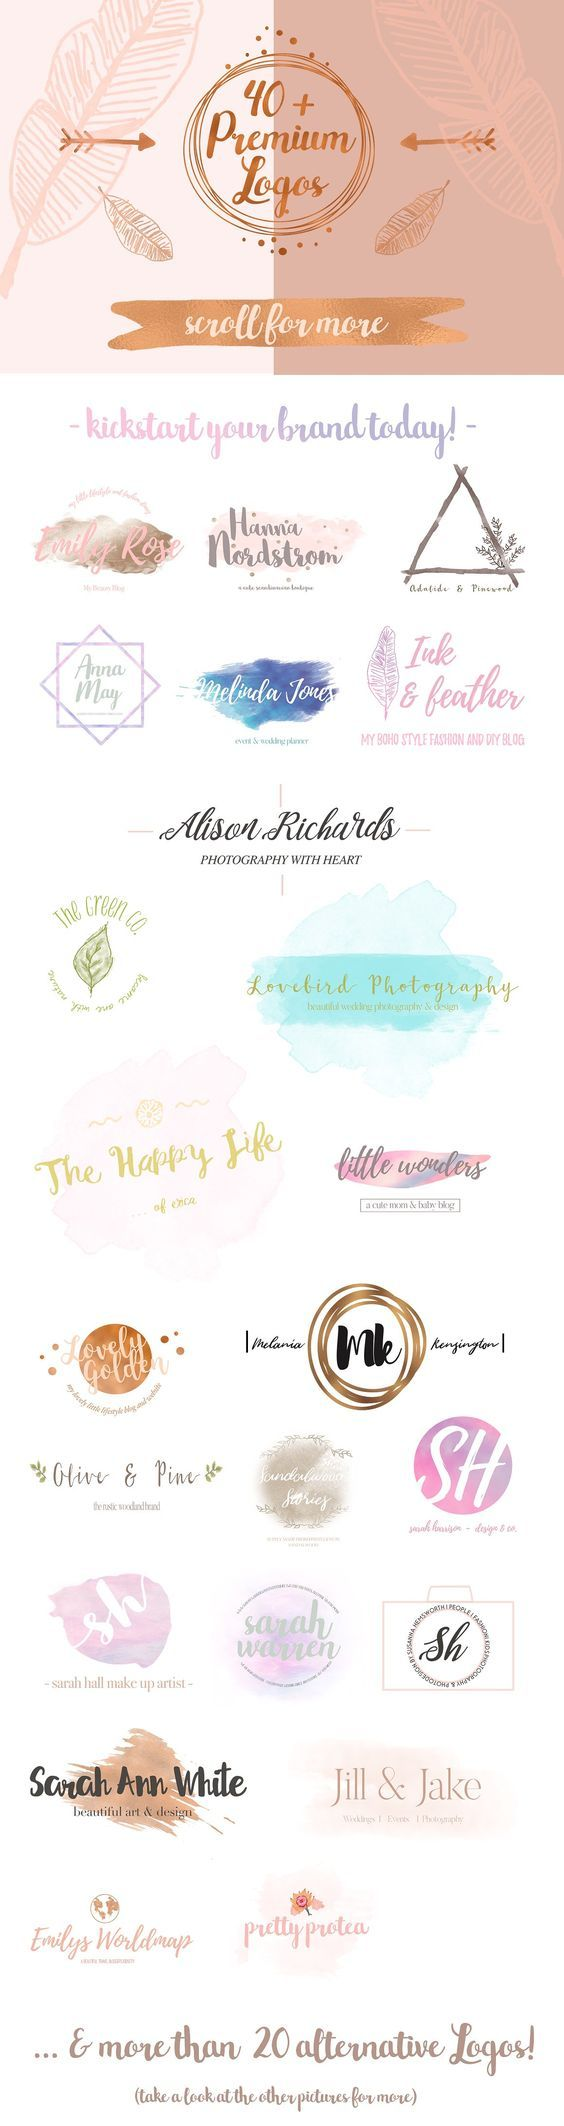 Pretty Premade Branding & Logo Kit